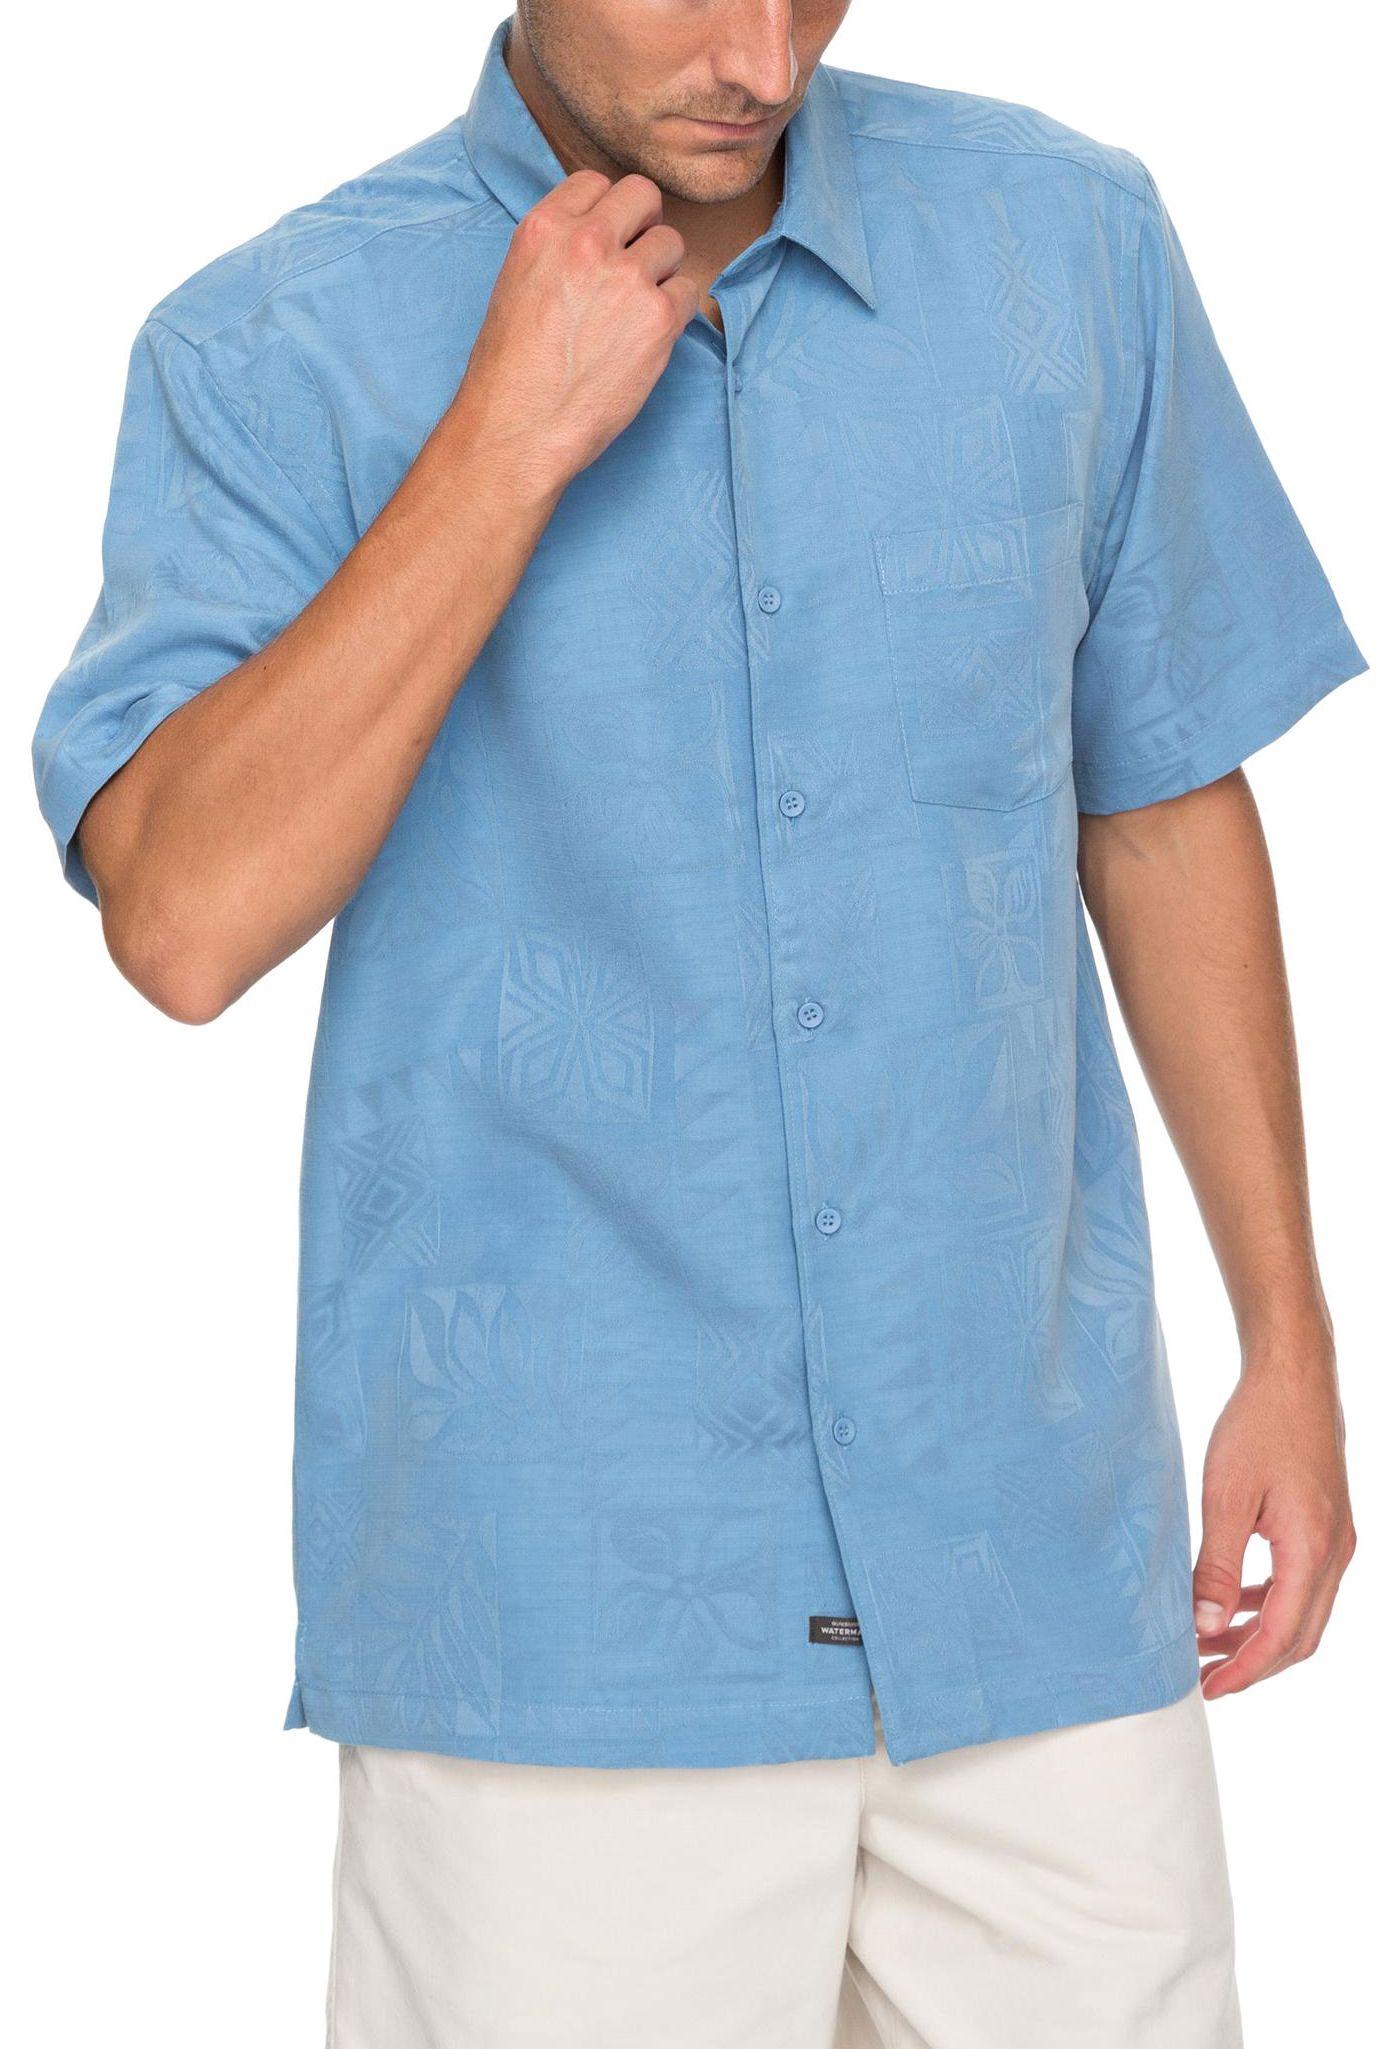 Quiksilver Men's Waterman Malama Bay Short Sleeve Shirt